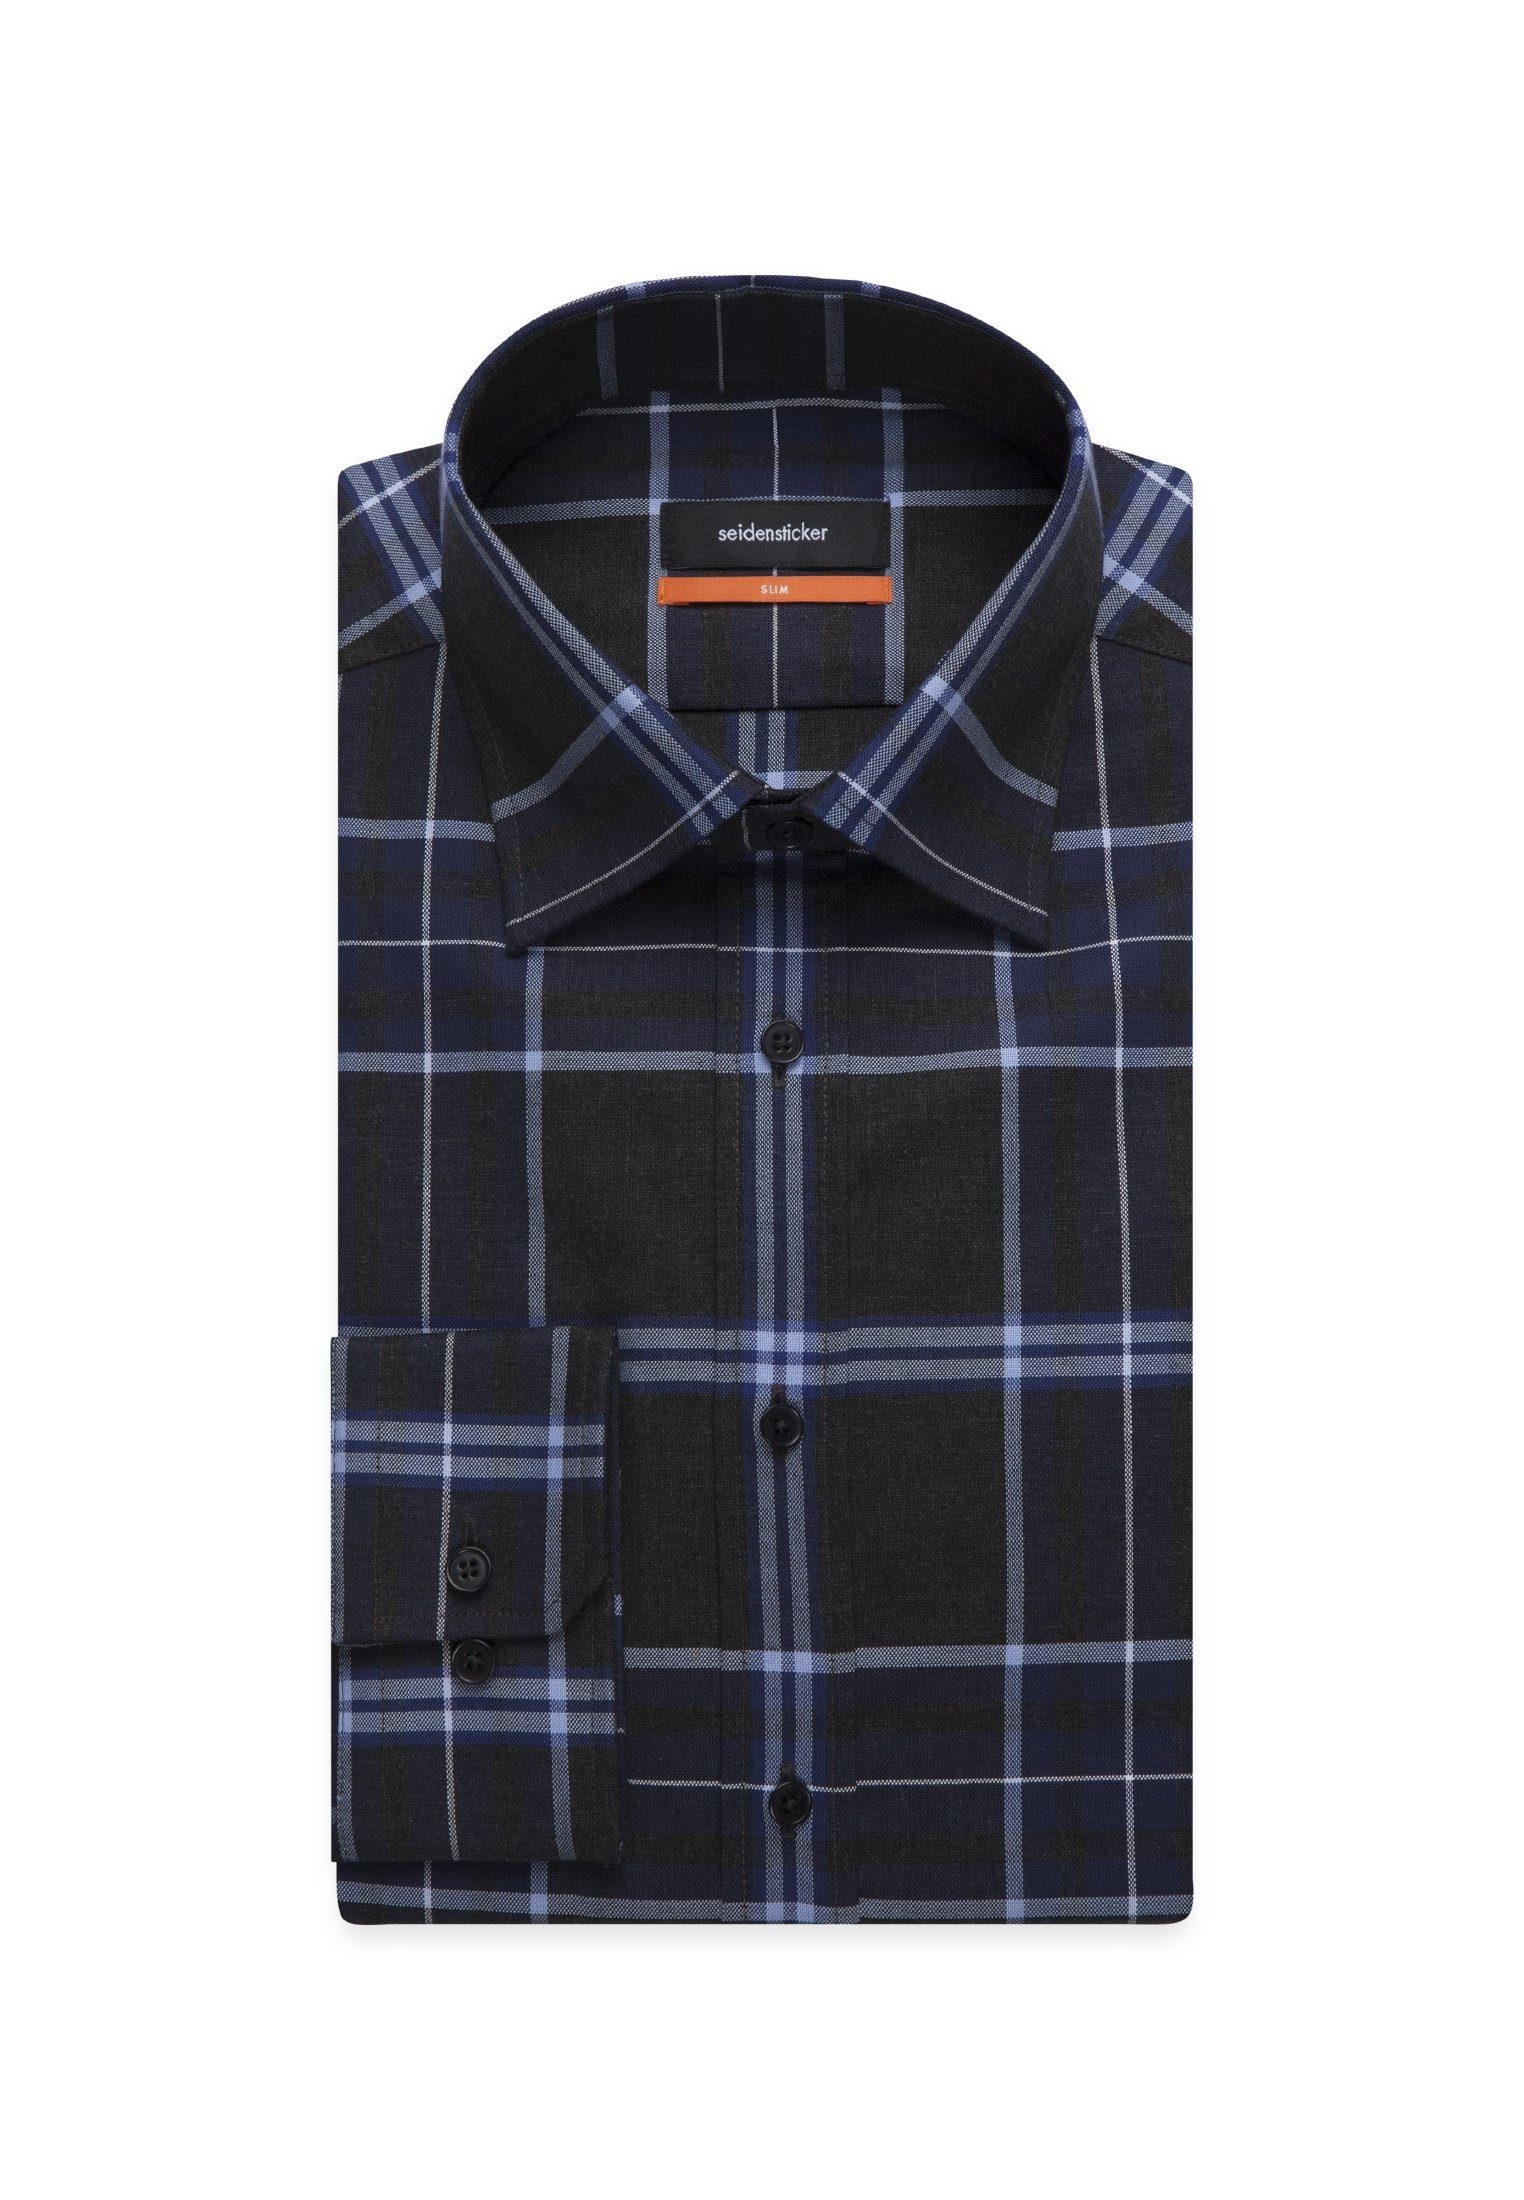 Kaufen »slim« Karo Covered down Online Slim Businesshemd button kragen Seidensticker Langarm uTF13KJlc